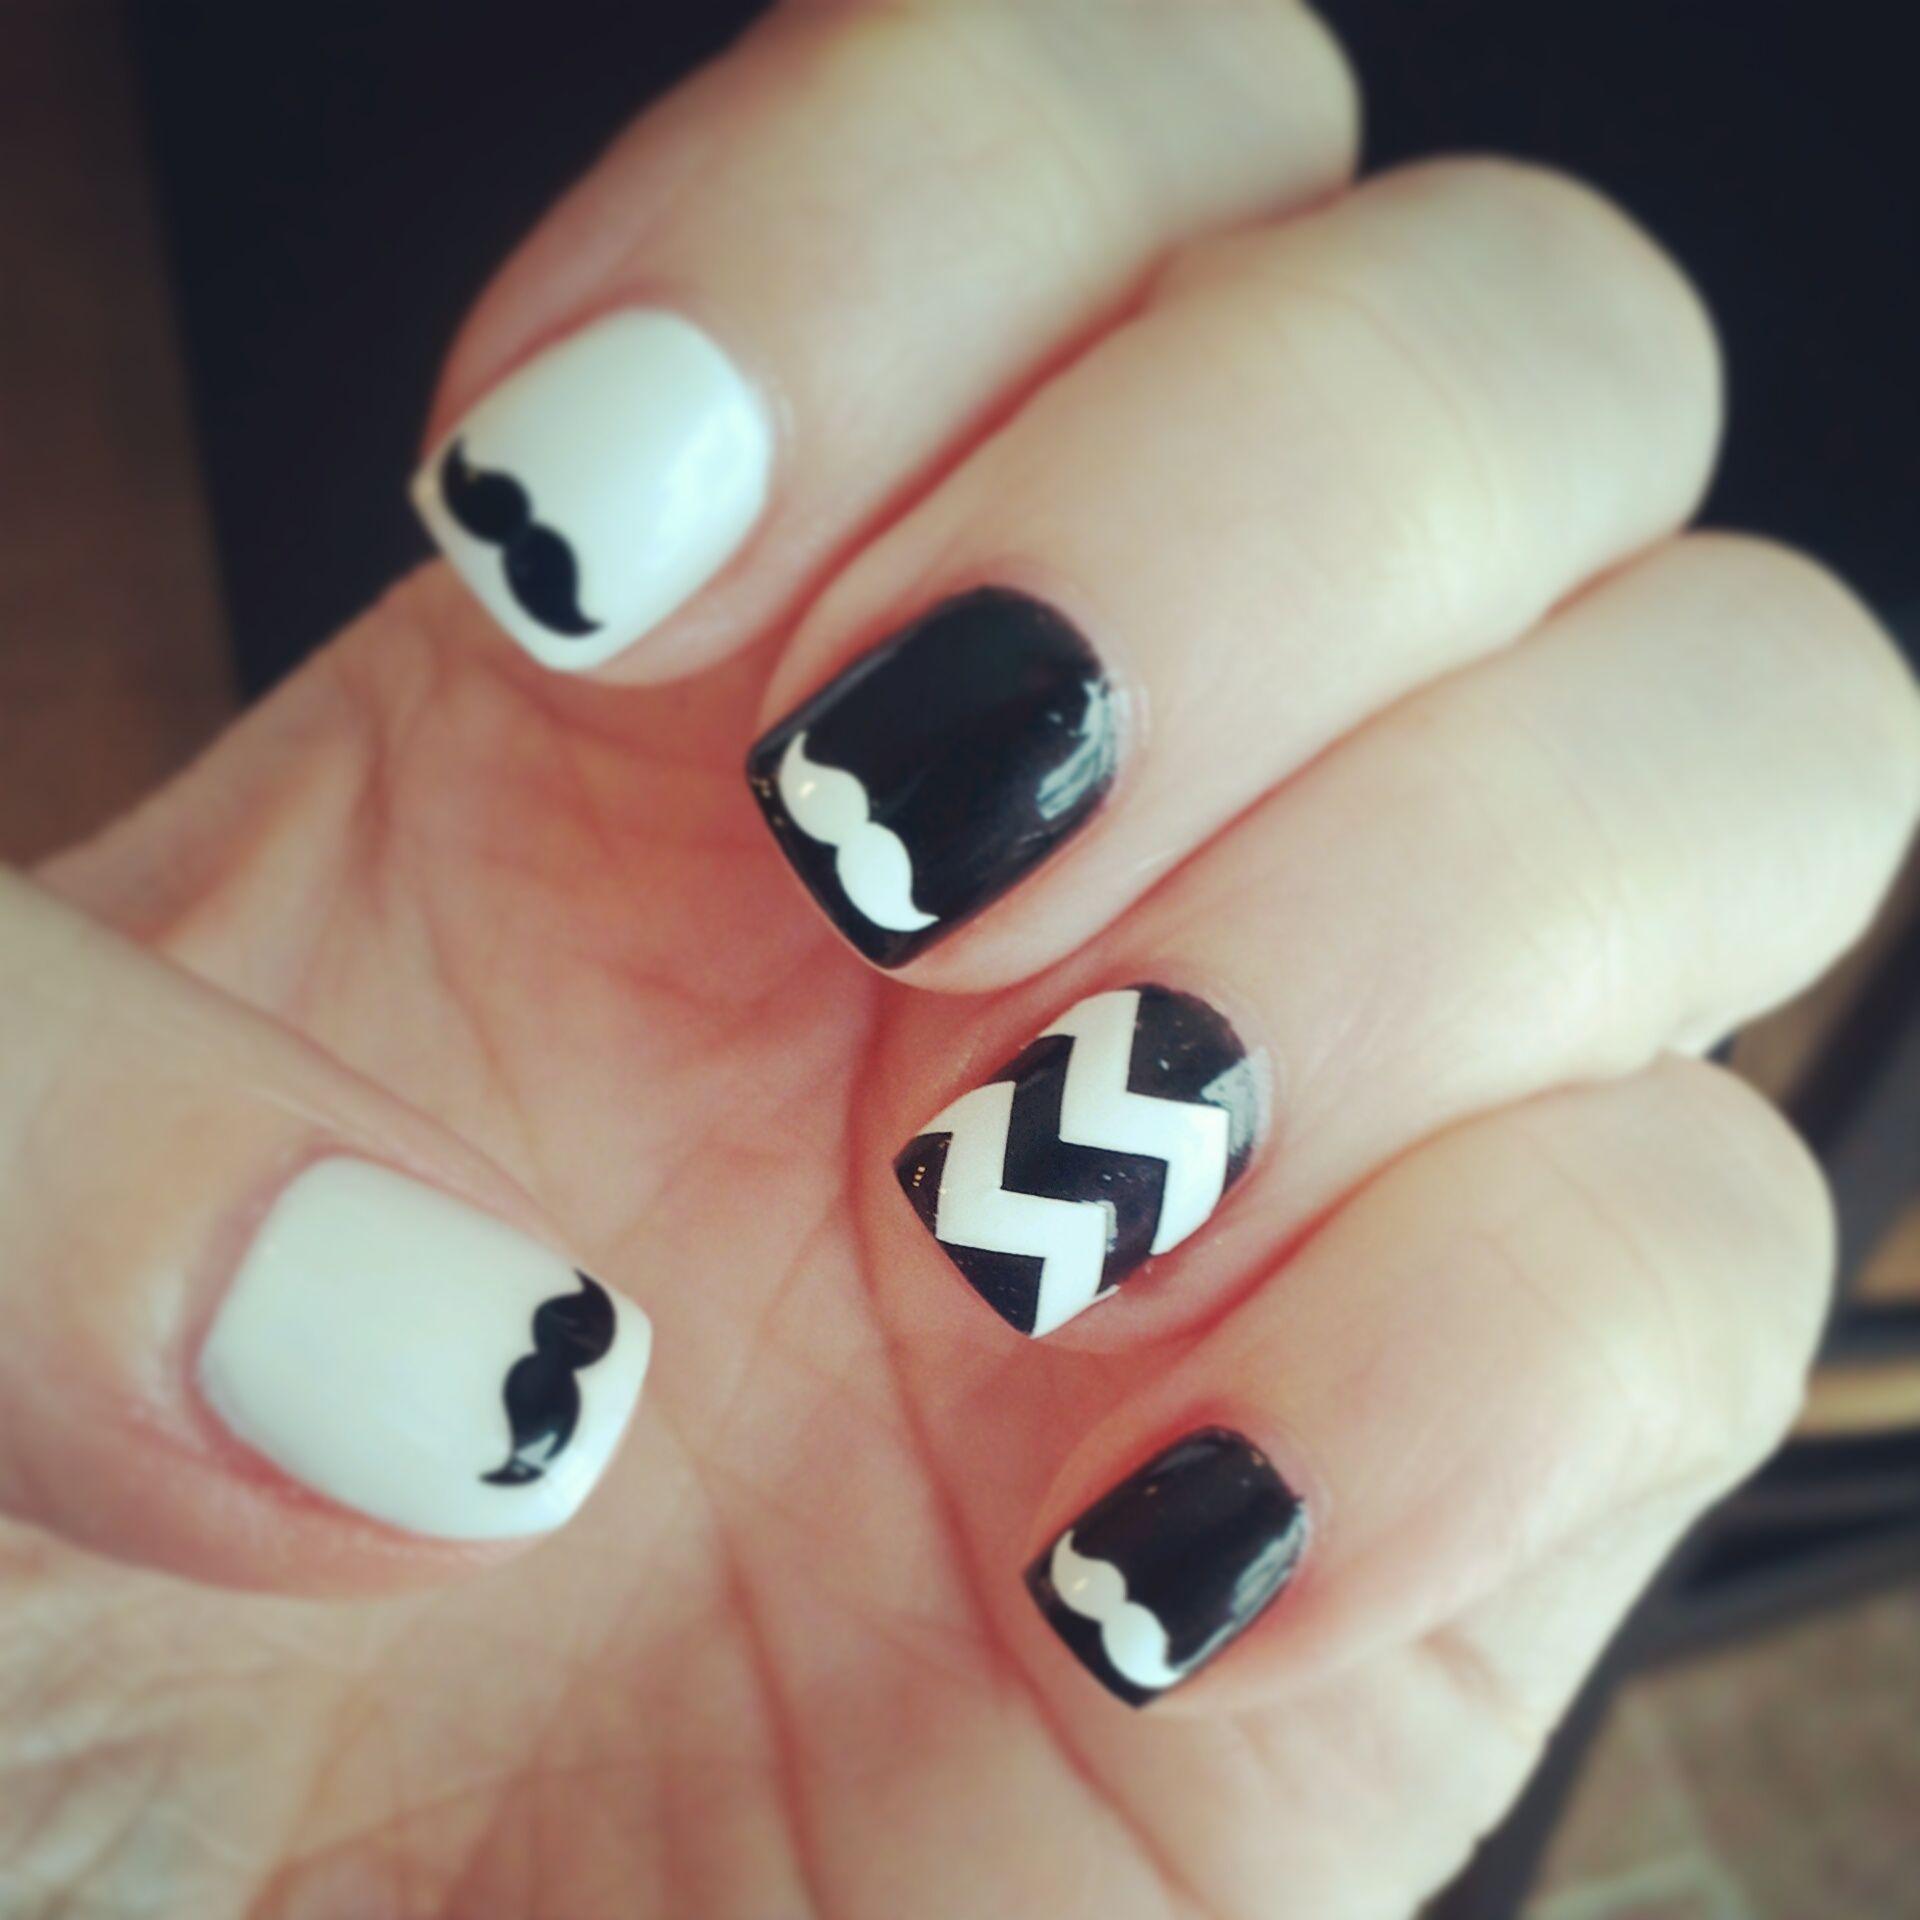 cheveron nail designs | March Business - Make it Stick Designs ...